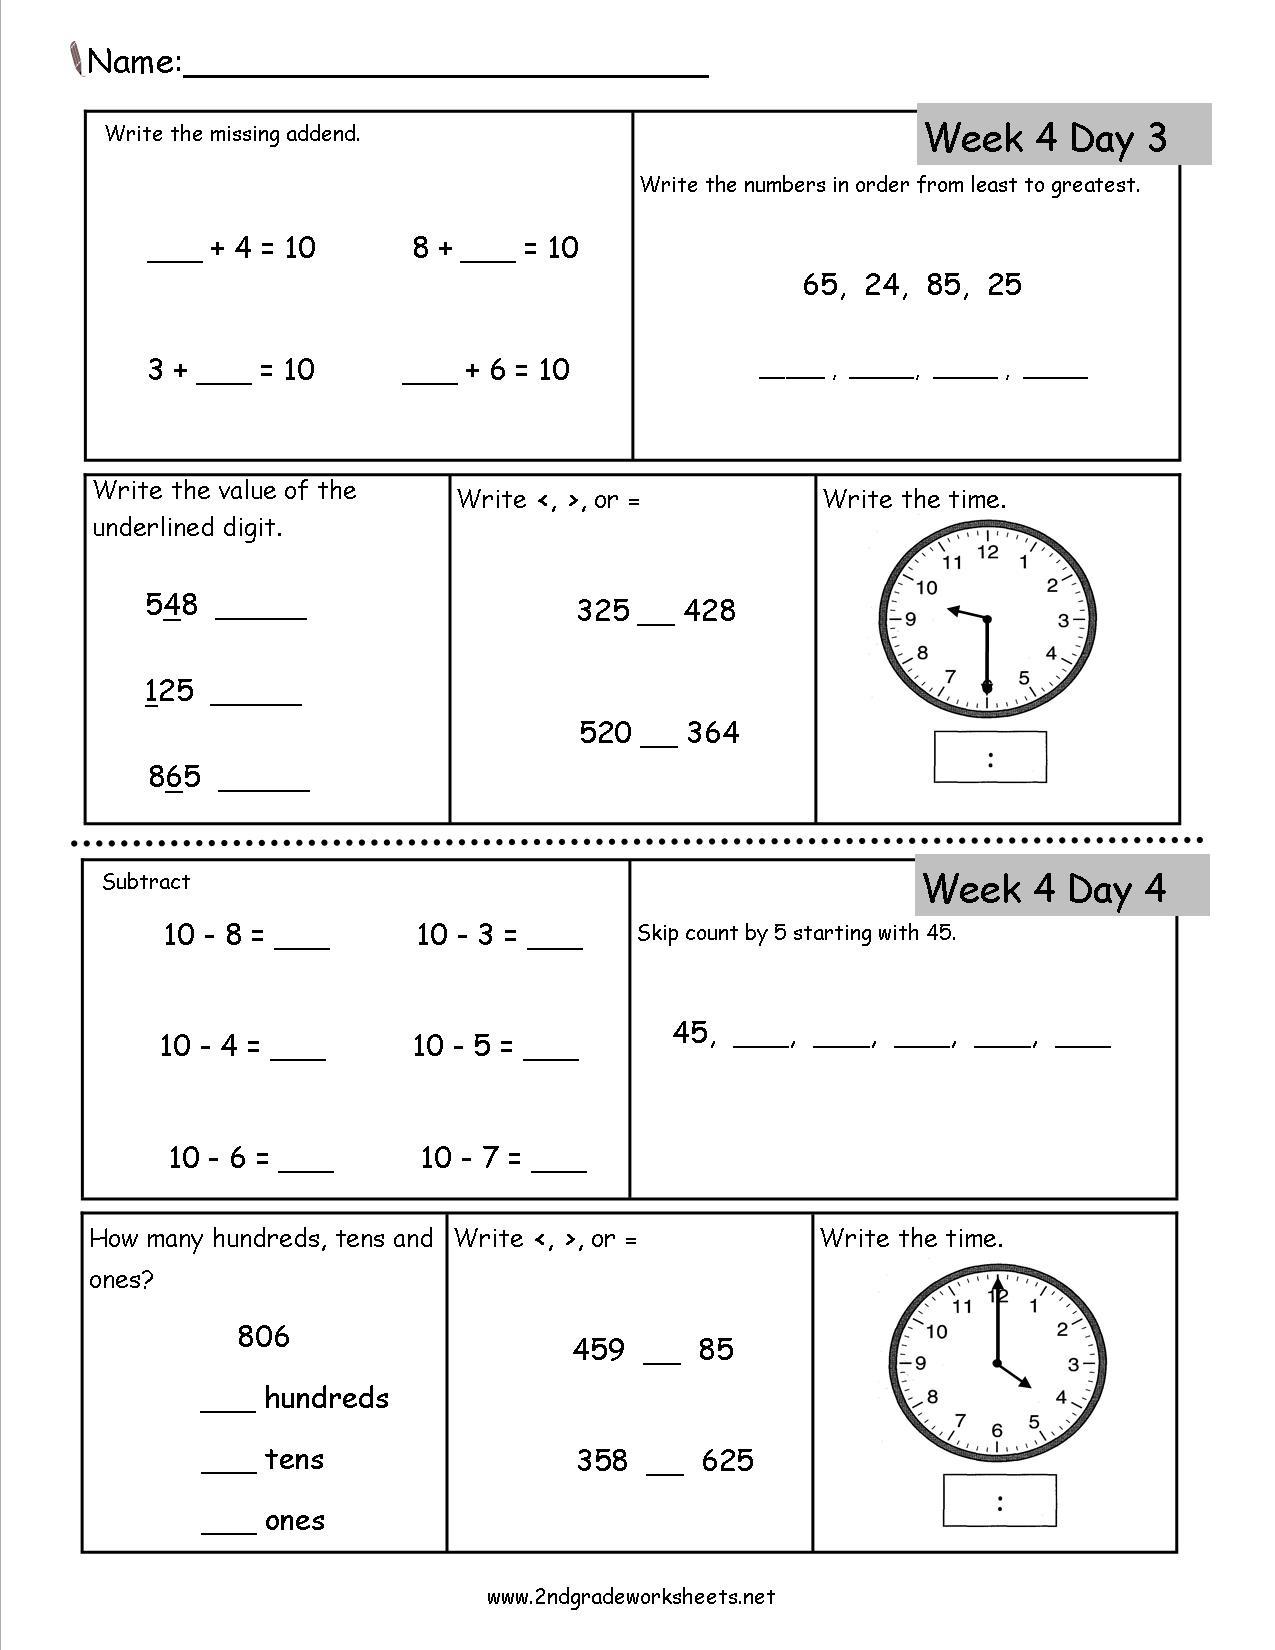 Free 2nd Grade Daily Math Worksheets